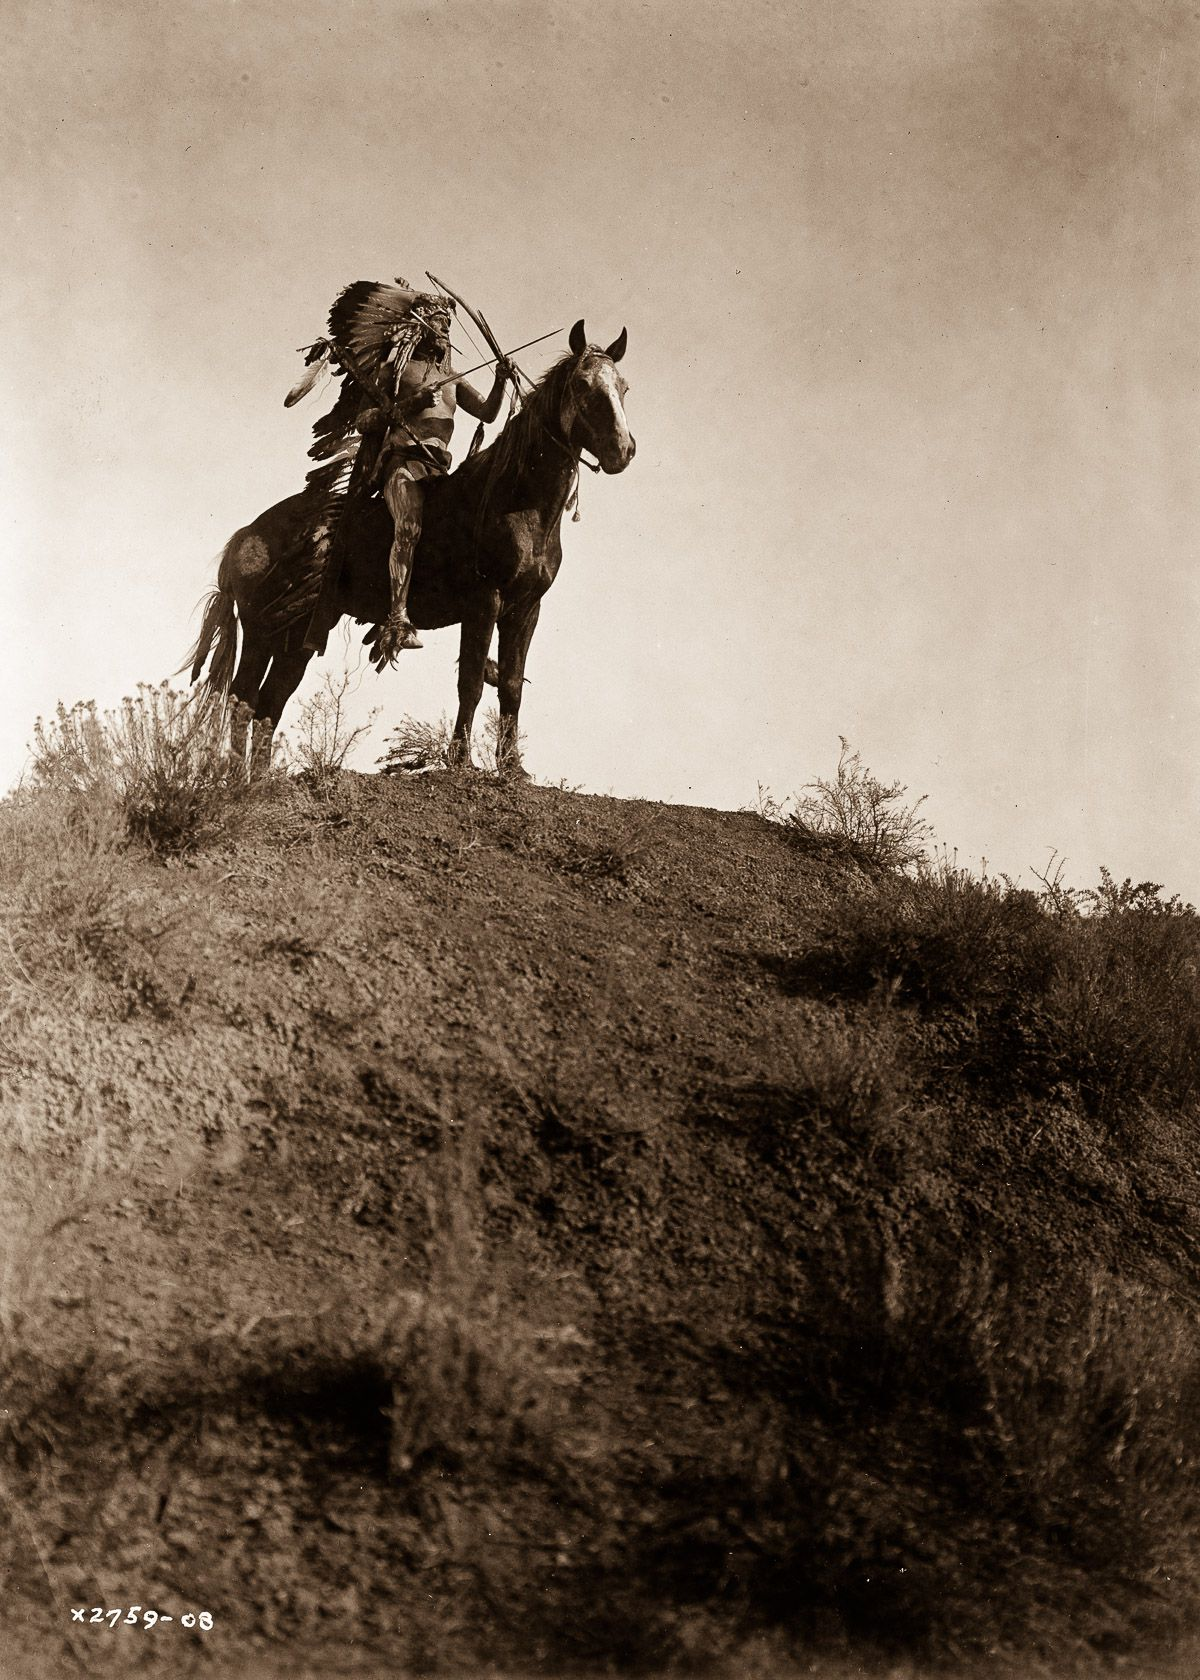 An Apsaroke man on horseback,  1908.  ©EDWARD S. CURTIS/LIBRARY OF CONGRESS